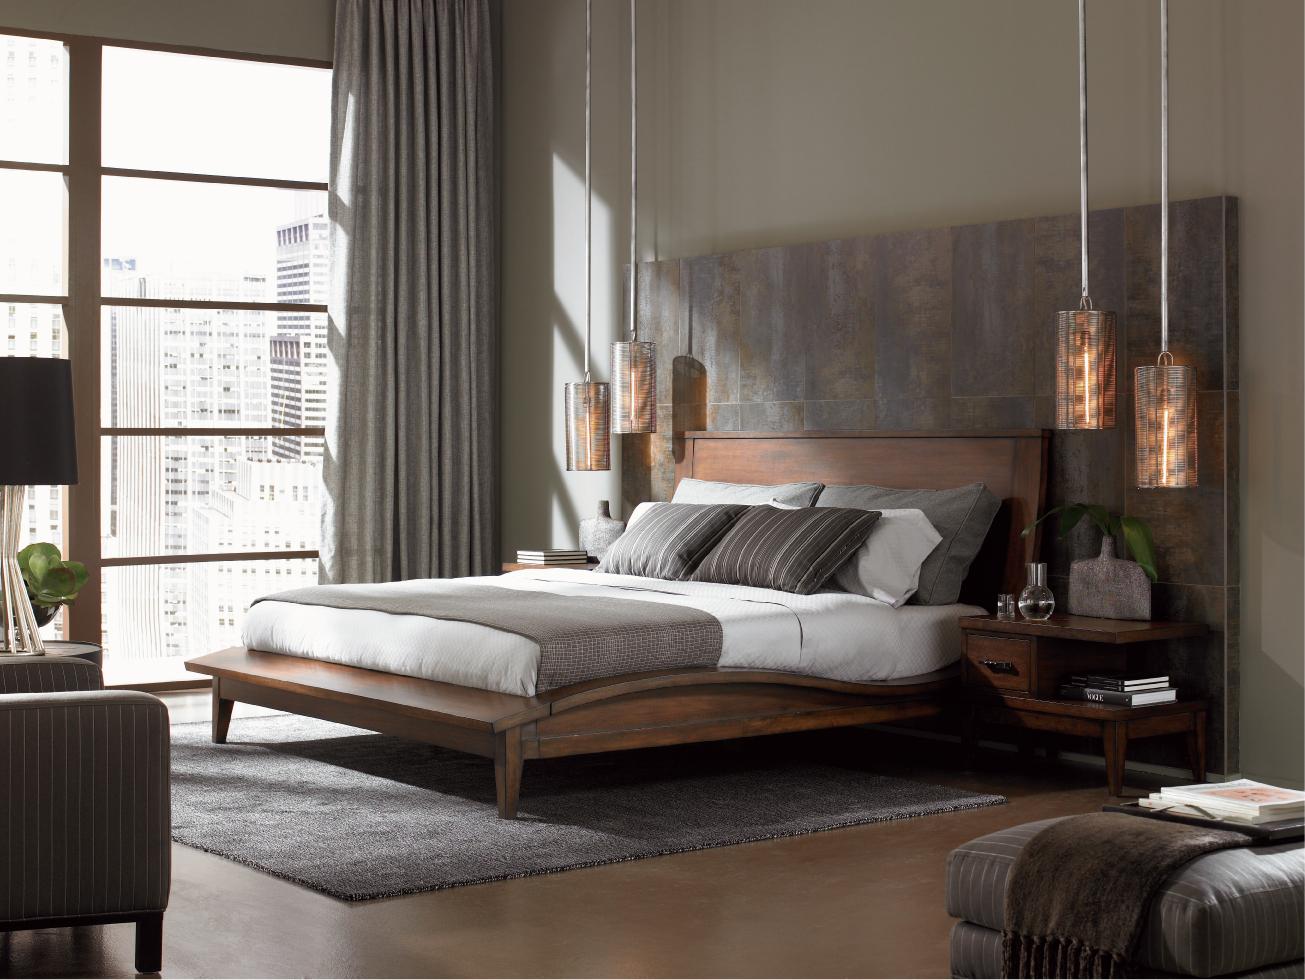 modern-bedroom-modern-decoration-16-on-bedroom-design-ideas